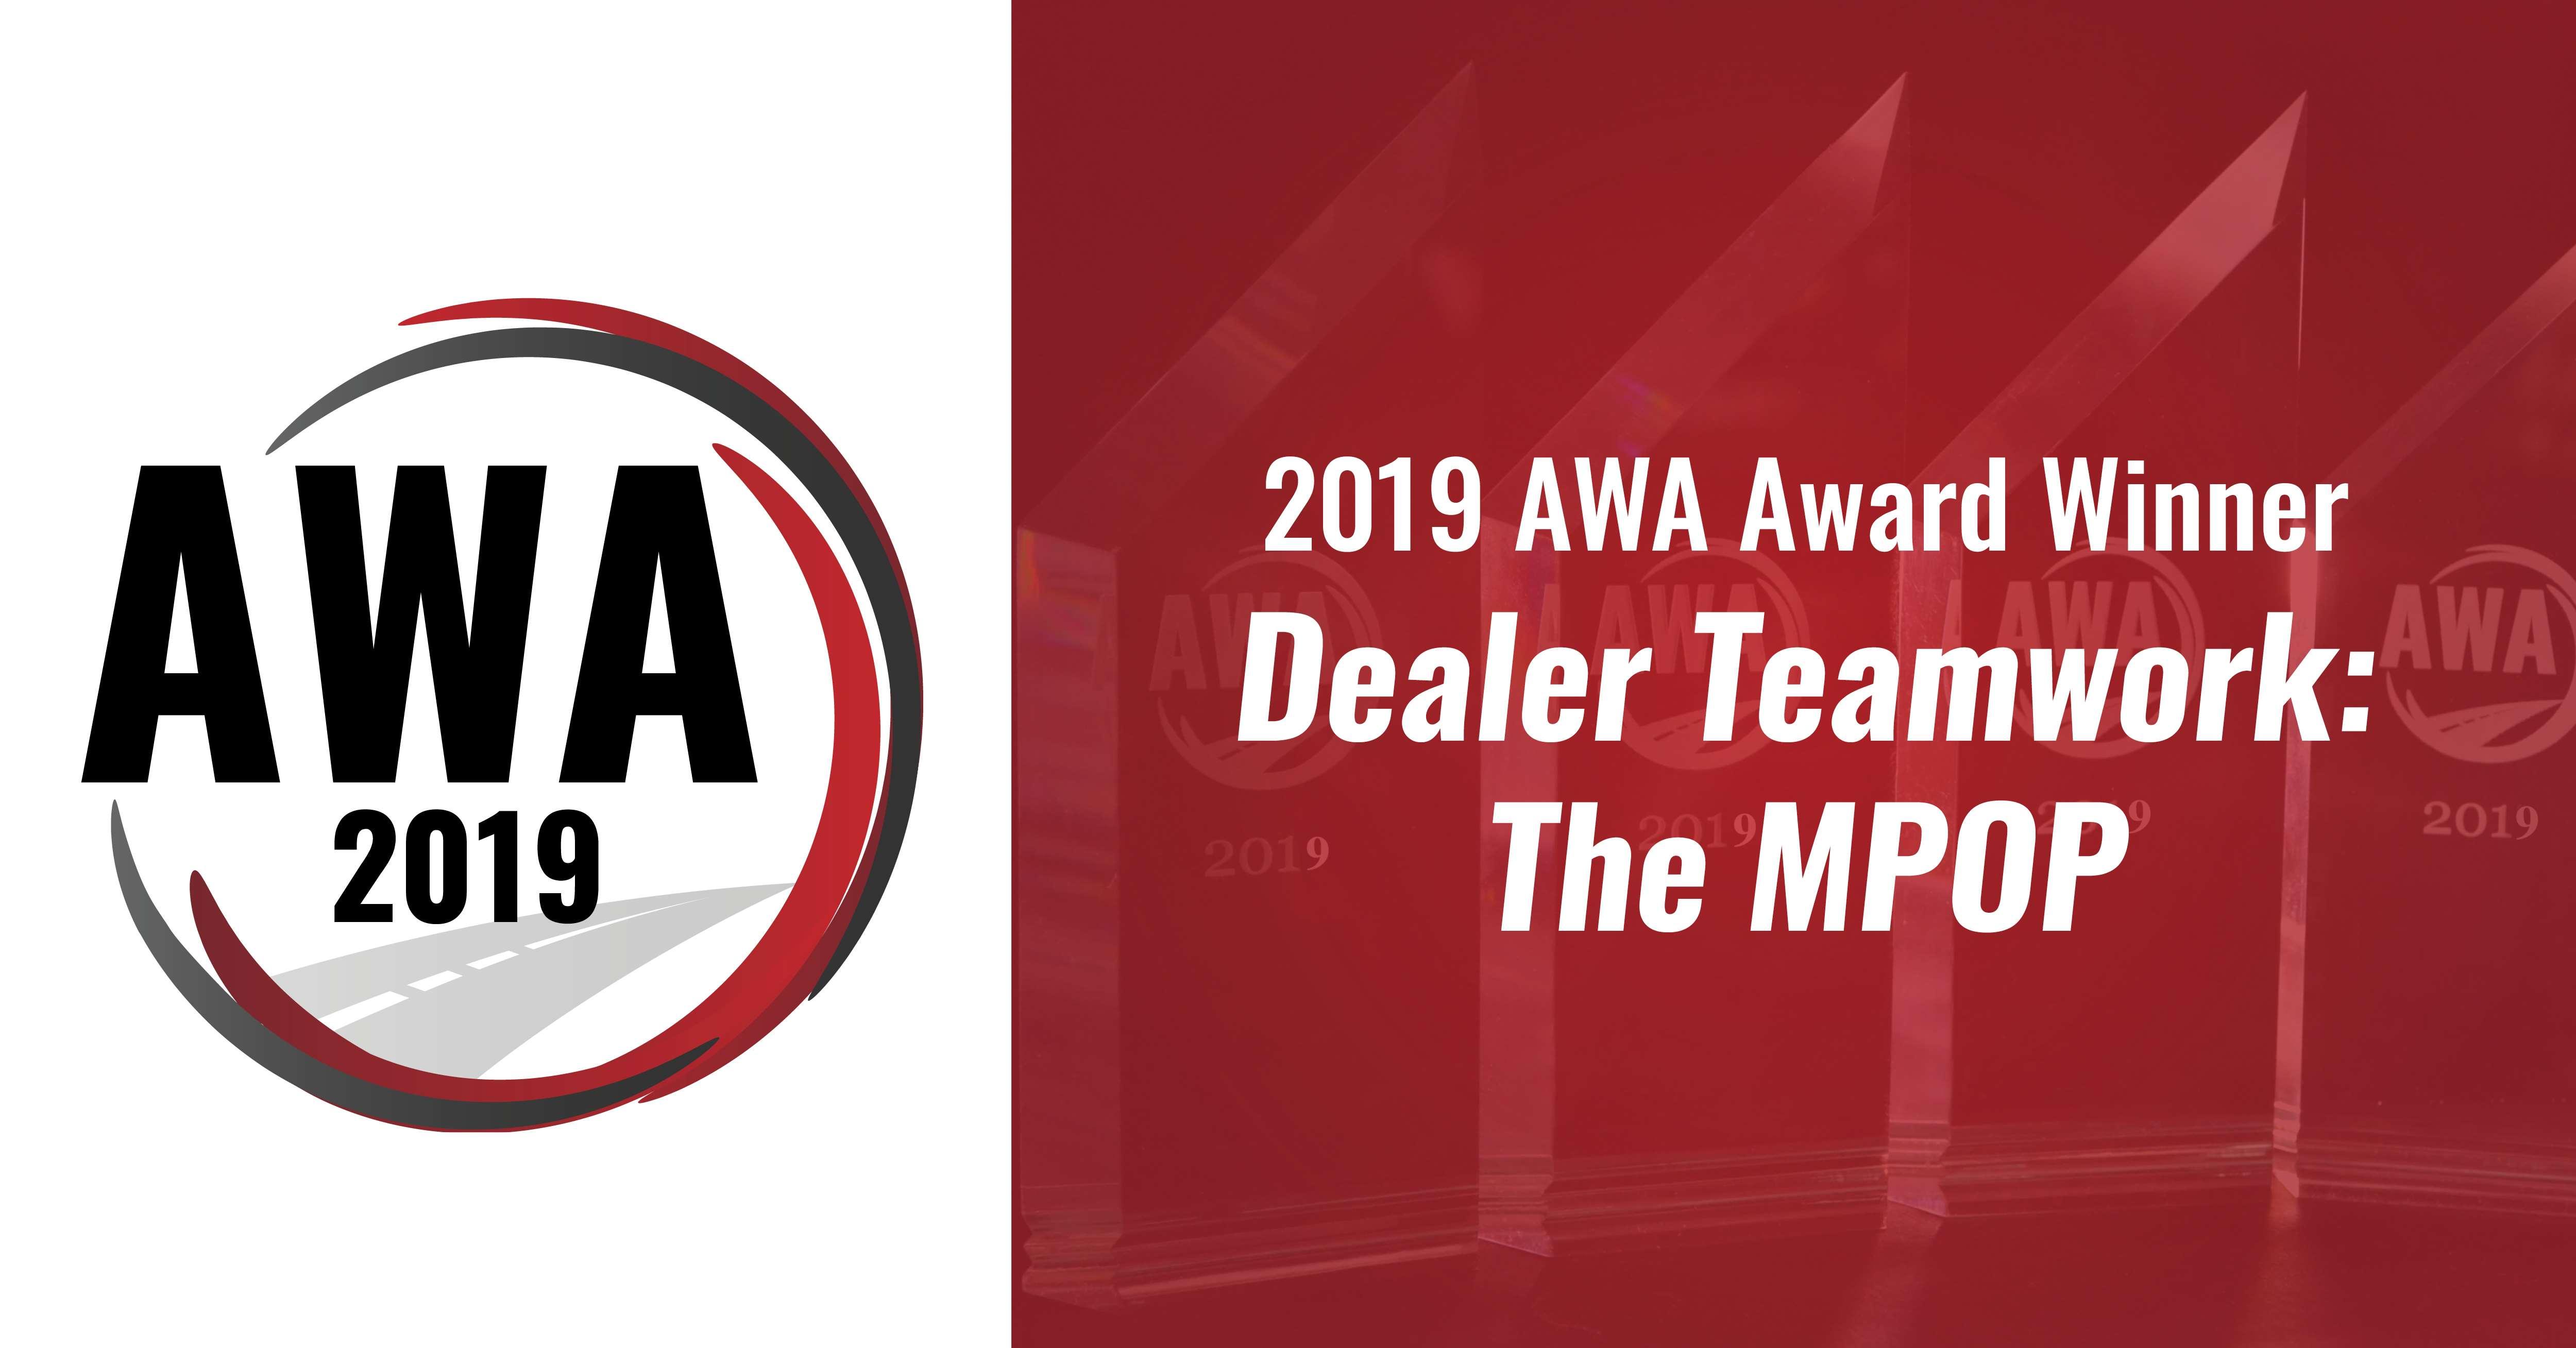 Dealer Teamwork Named Innovation Leader at 2019 AWA Awards